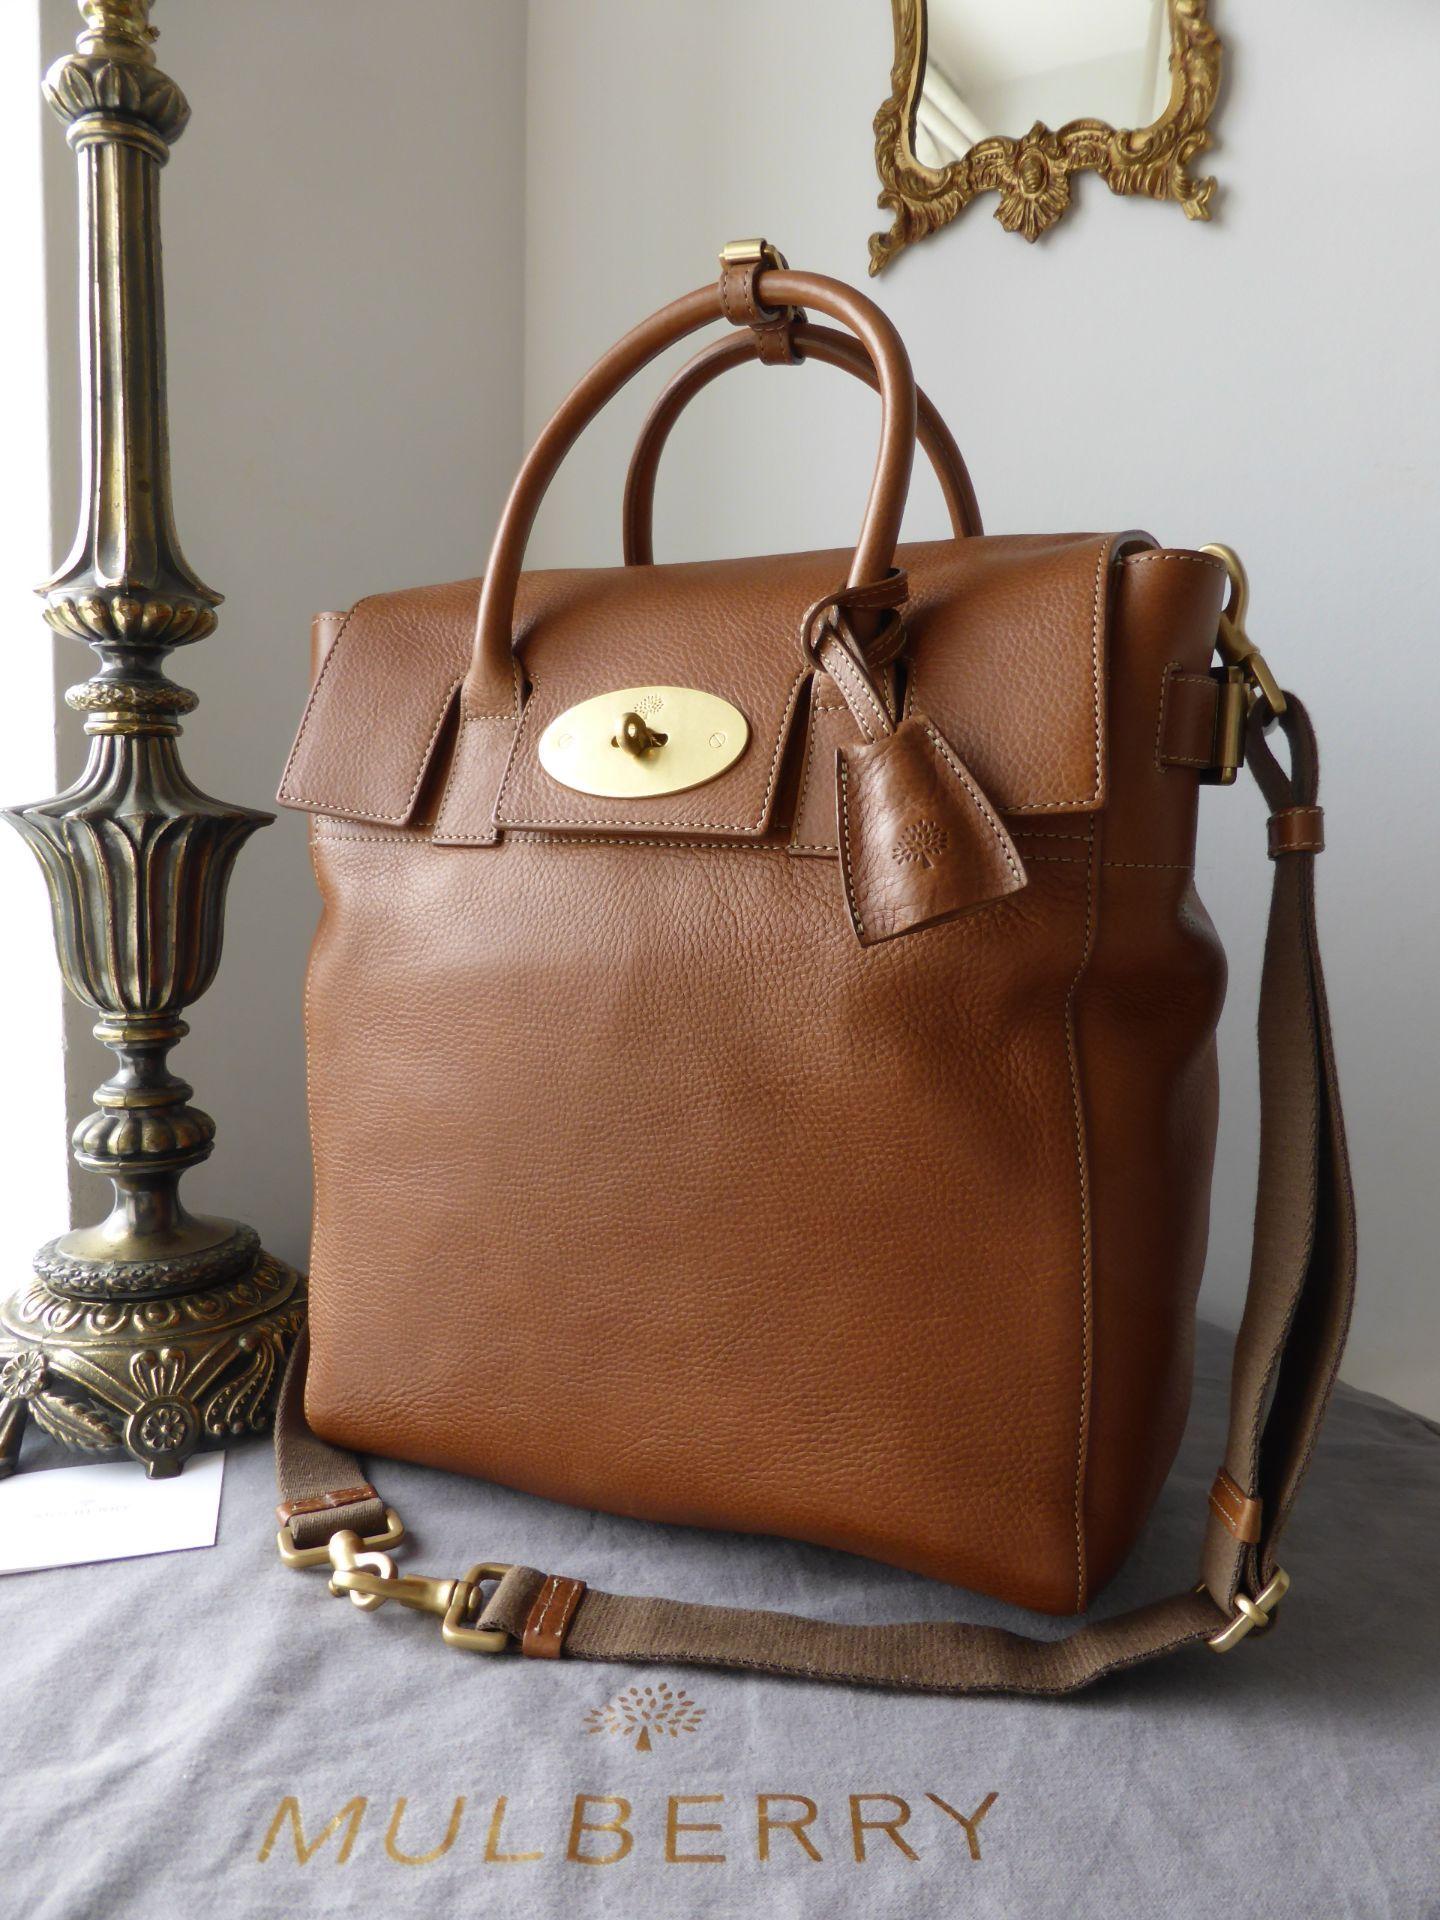 ac6b896736 Mulberry Cara Delevingne Large Bag in Oak Natural Leather  gt  https   www